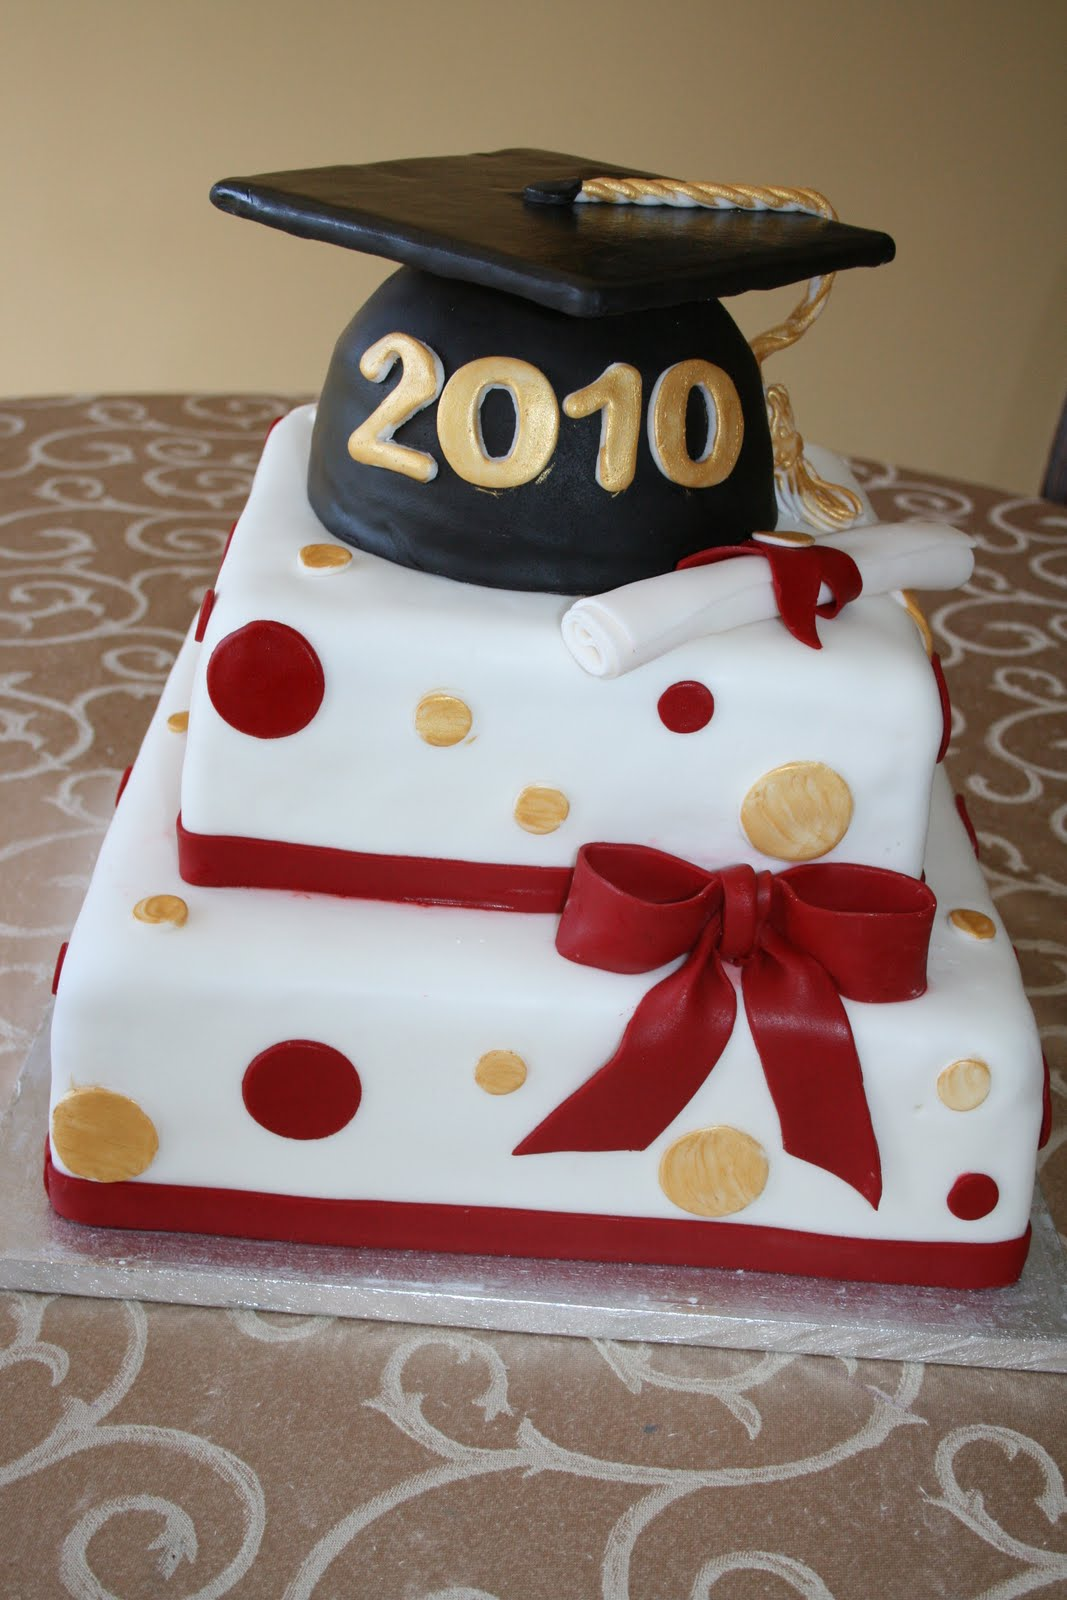 Graduation Cakes and CupcakesGraduation Cakes